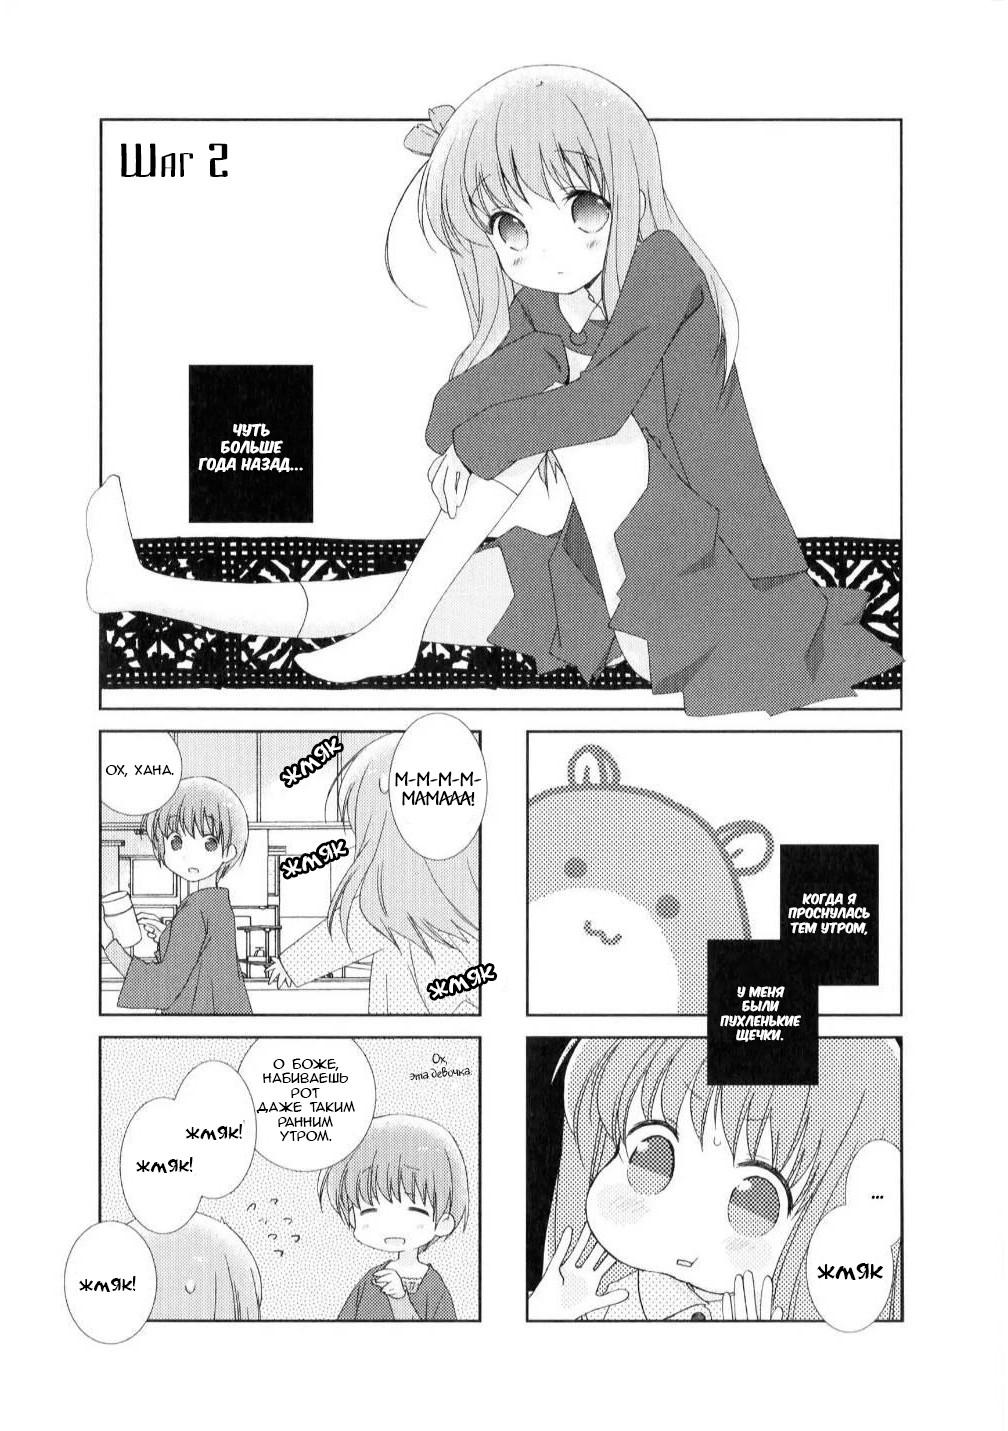 https://r1.ninemanga.com/comics/pic2/59/33723/426921/1535162427635.jpg Page 1